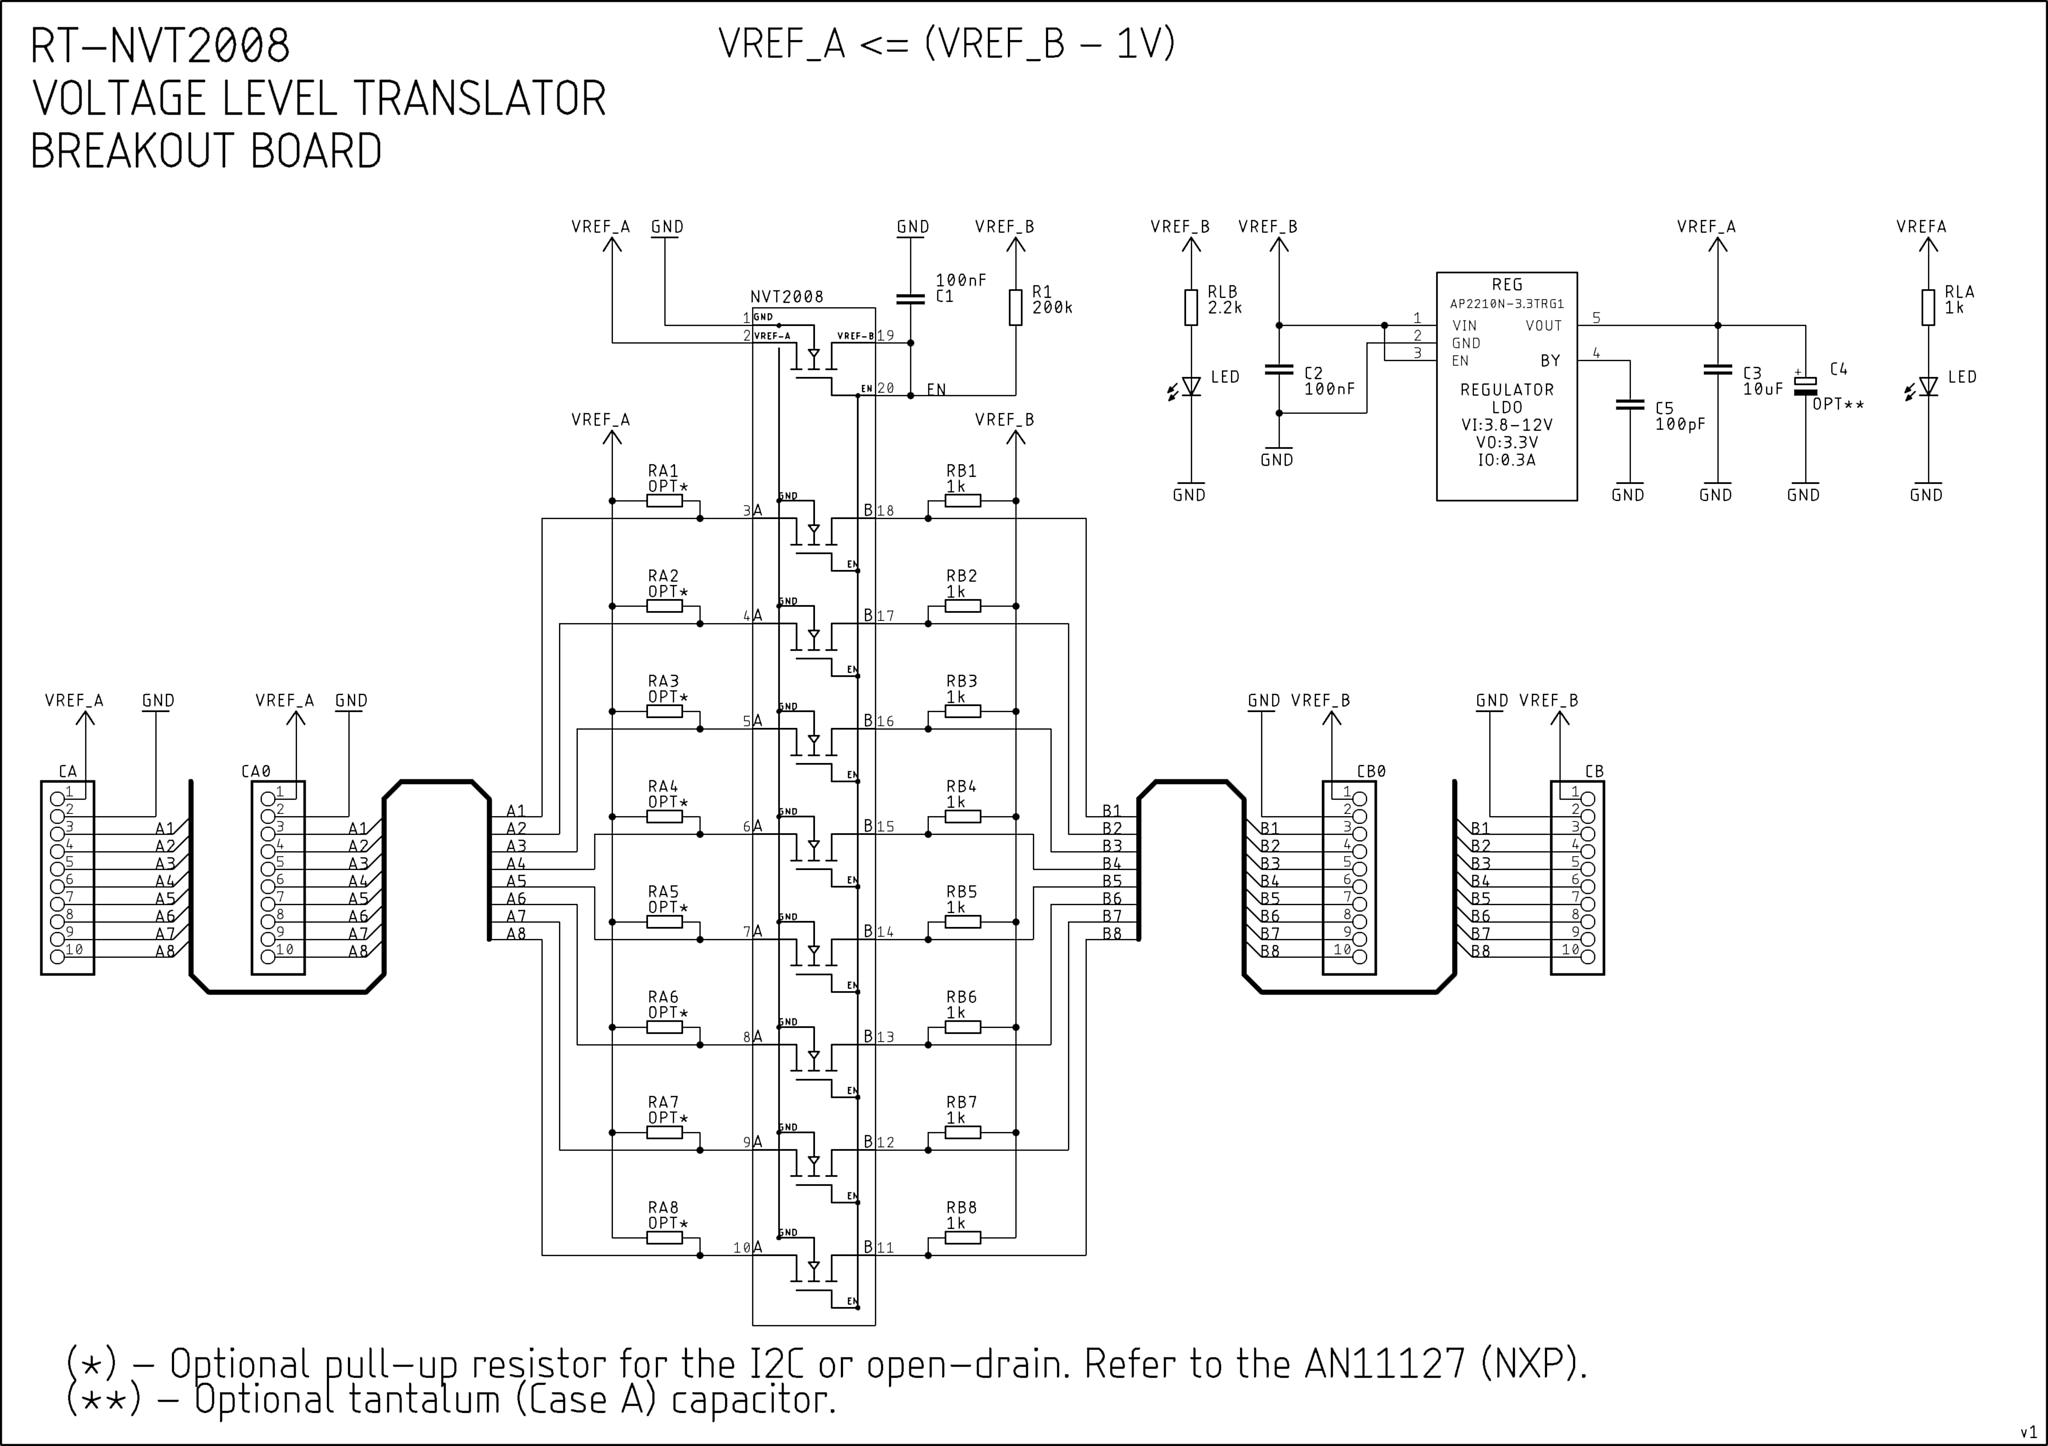 RT-NVT2008 Circuit Diagram